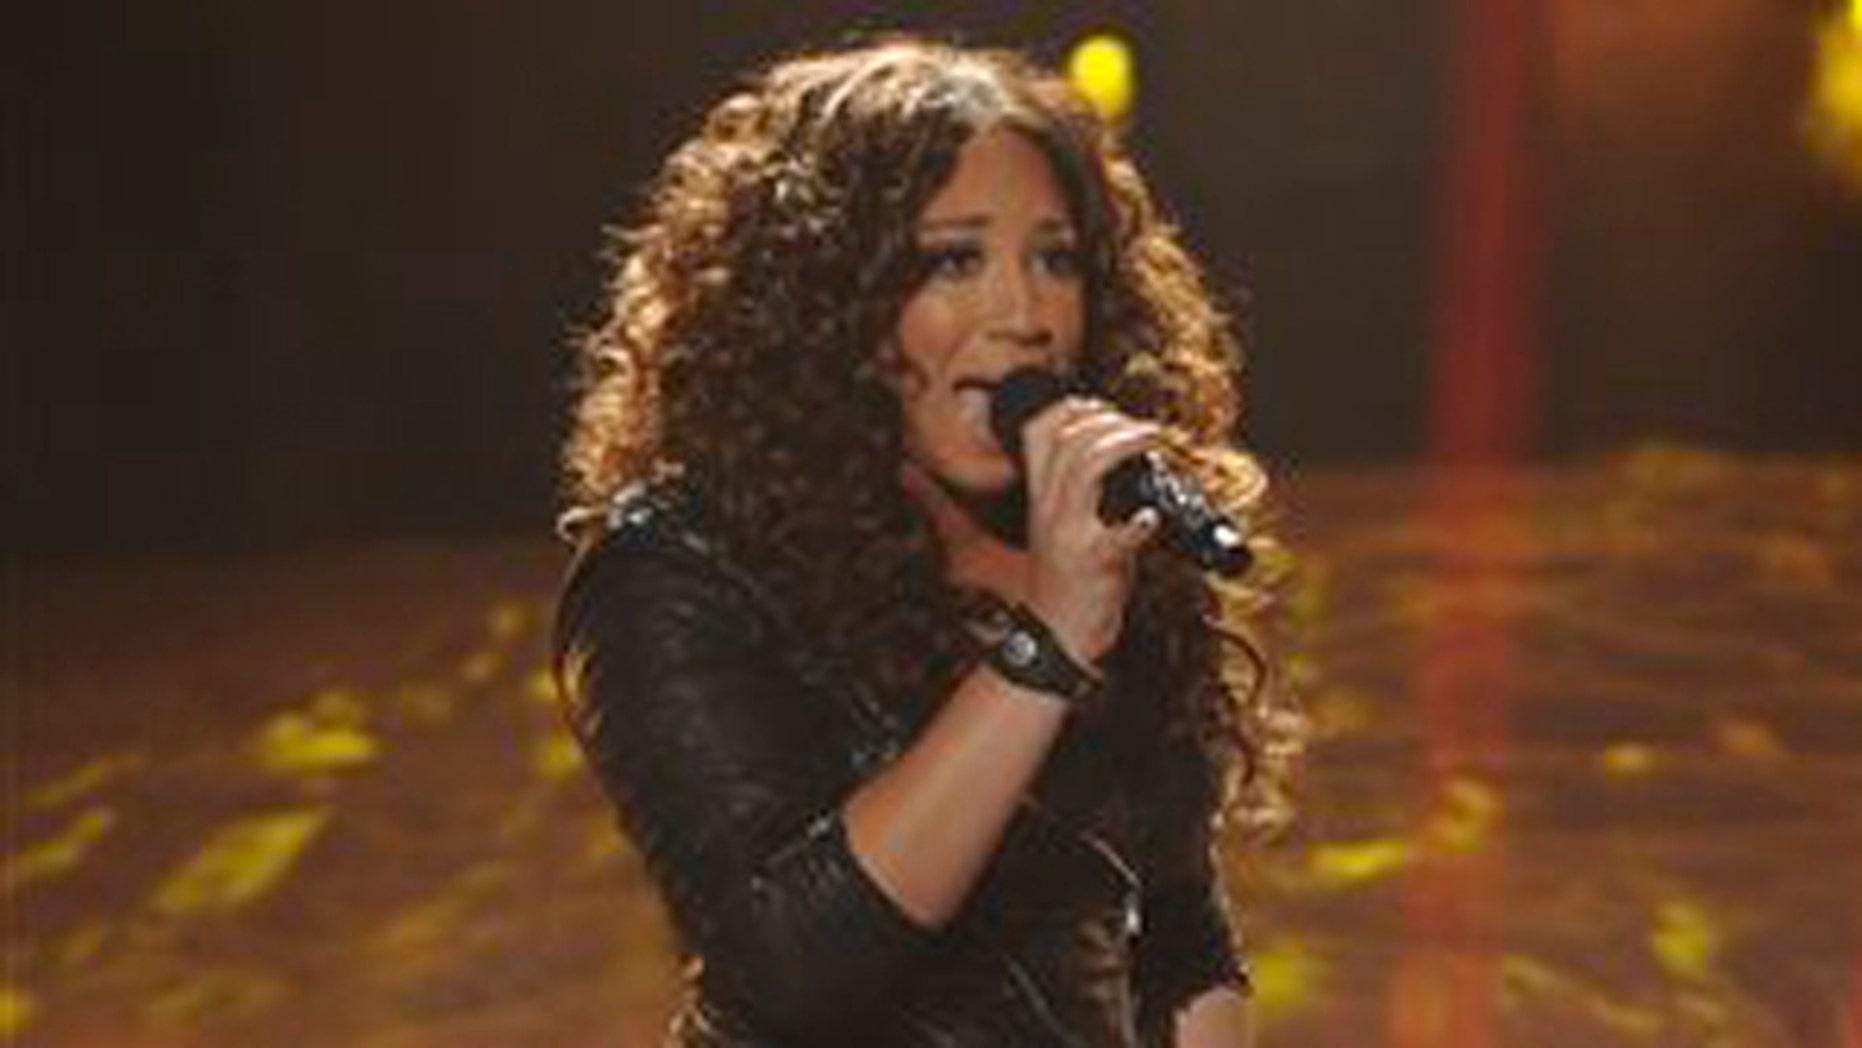 Melanie Amaro Wins 'The X Factor' | Fox News